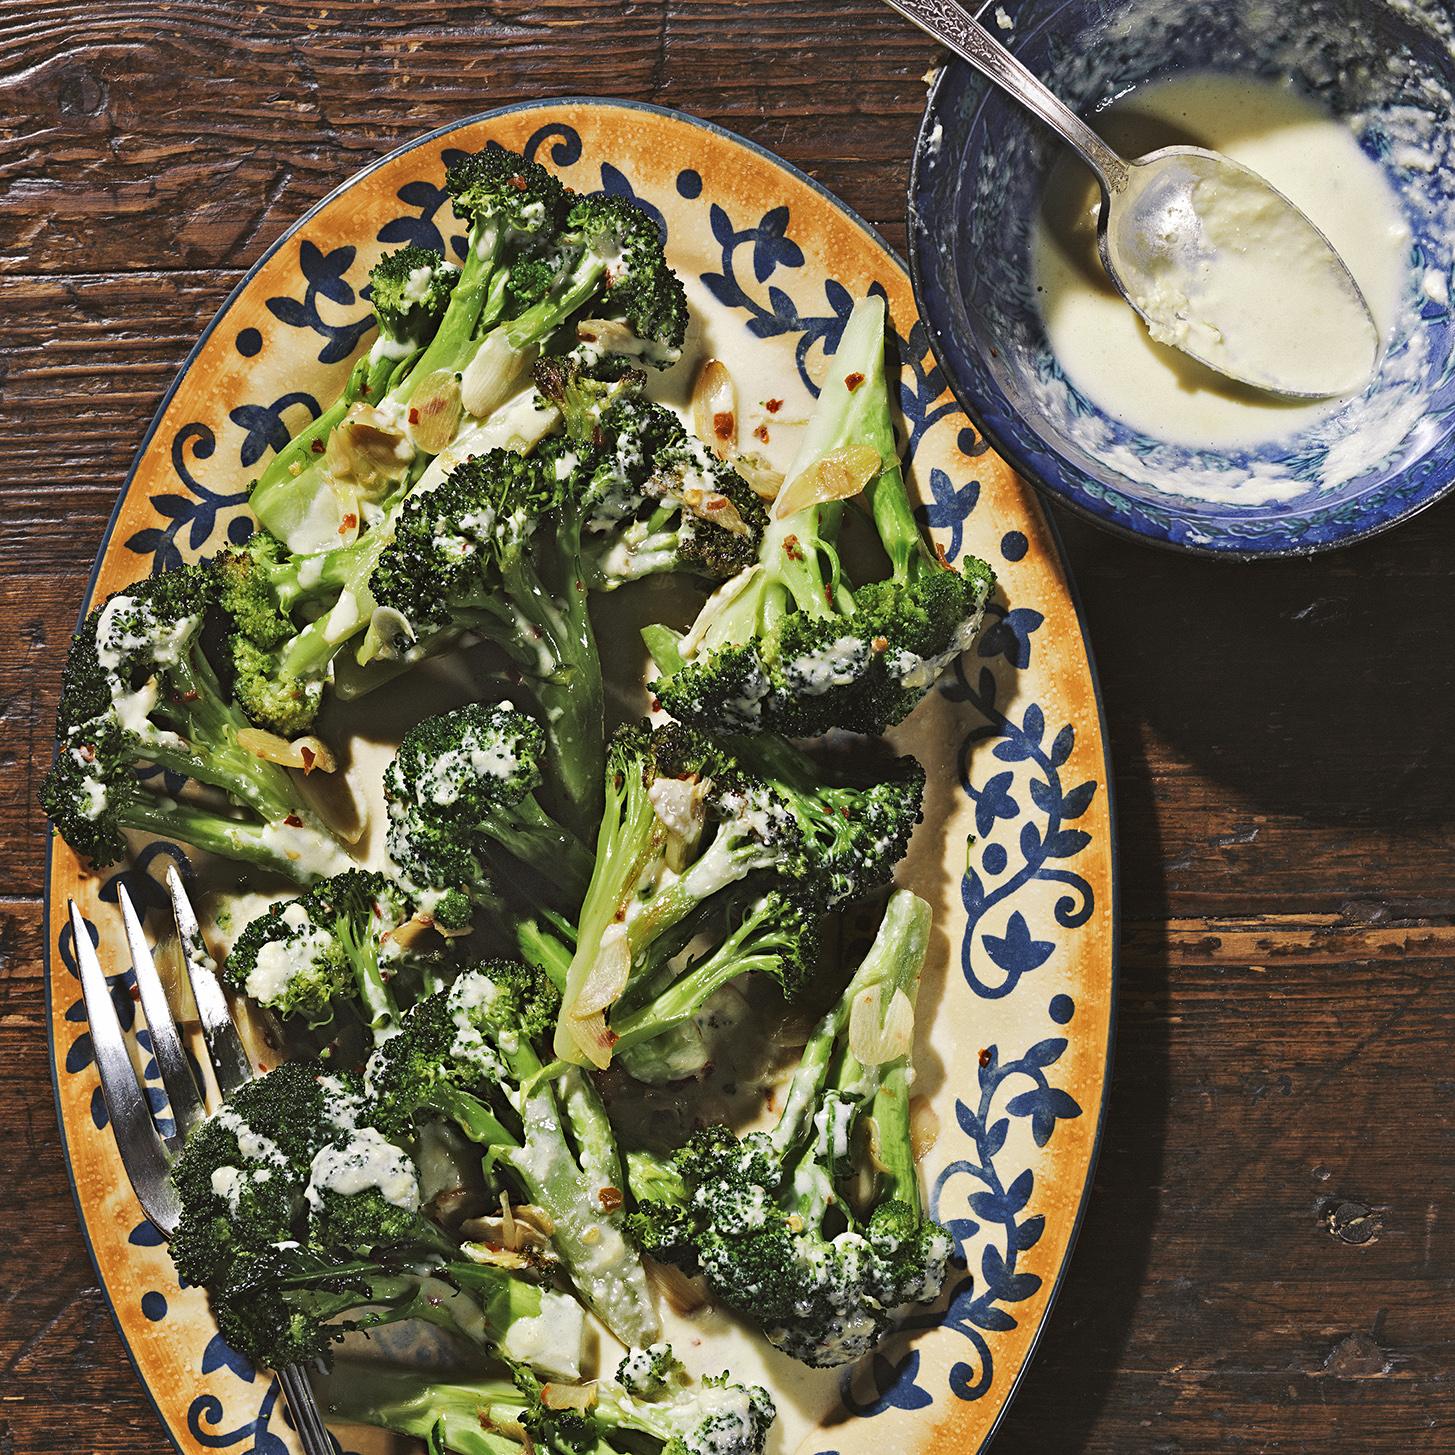 creamy garlic sauce with broccoli